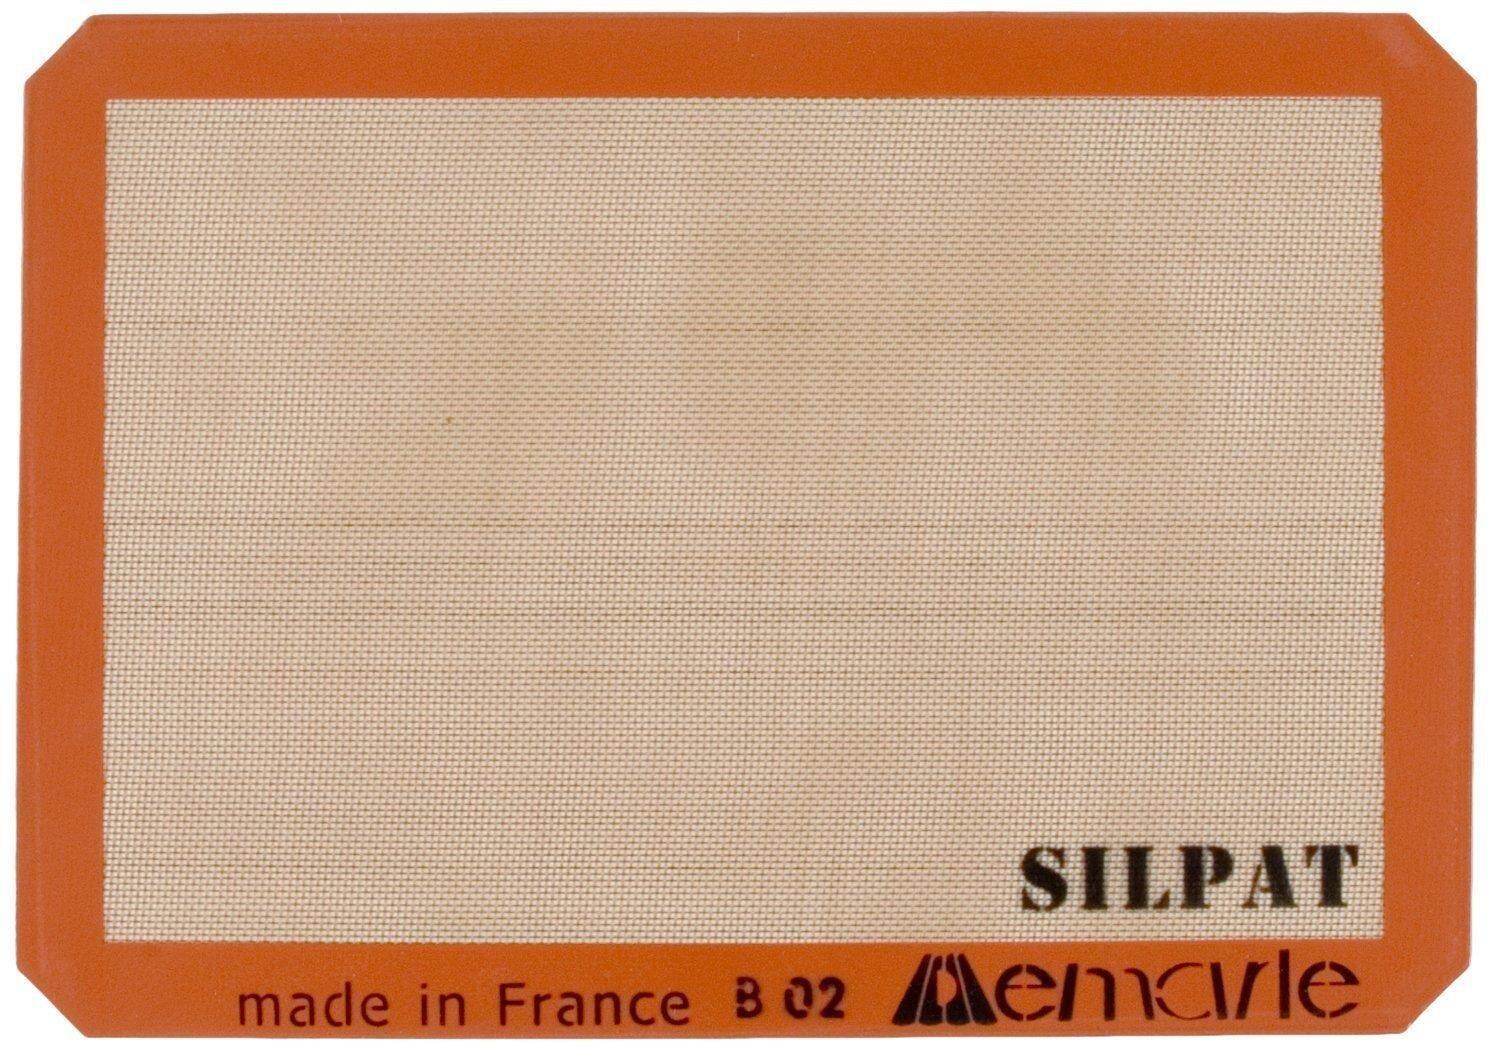 Silpat Premium Non-Stick Silicone Baking Mat, Half Sheet Size, 11-5/8inch x 16-1/2inch